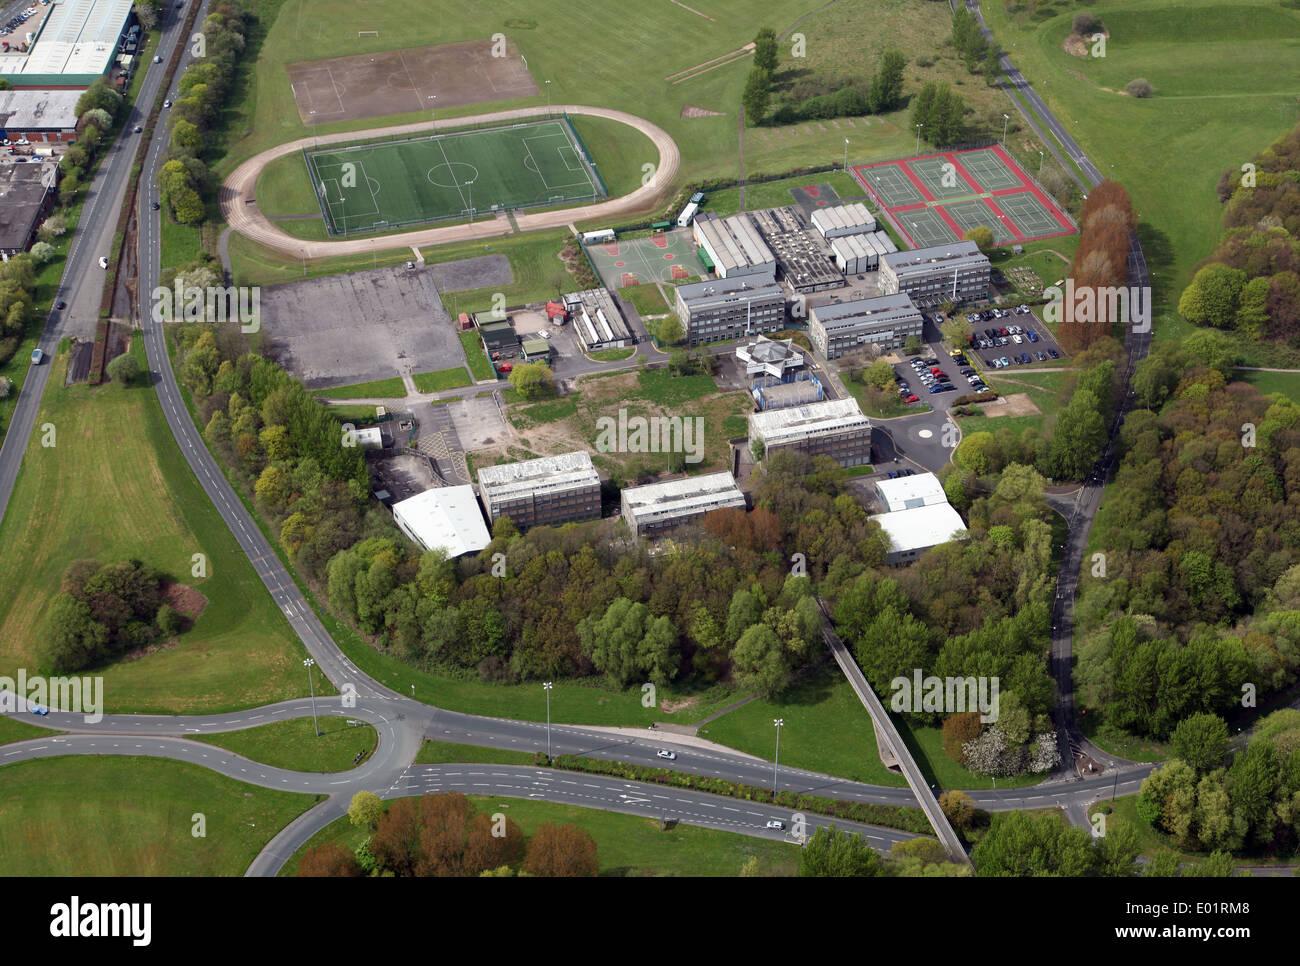 Vista aérea de Glenburn Sports College en Skelmersdale Imagen De Stock